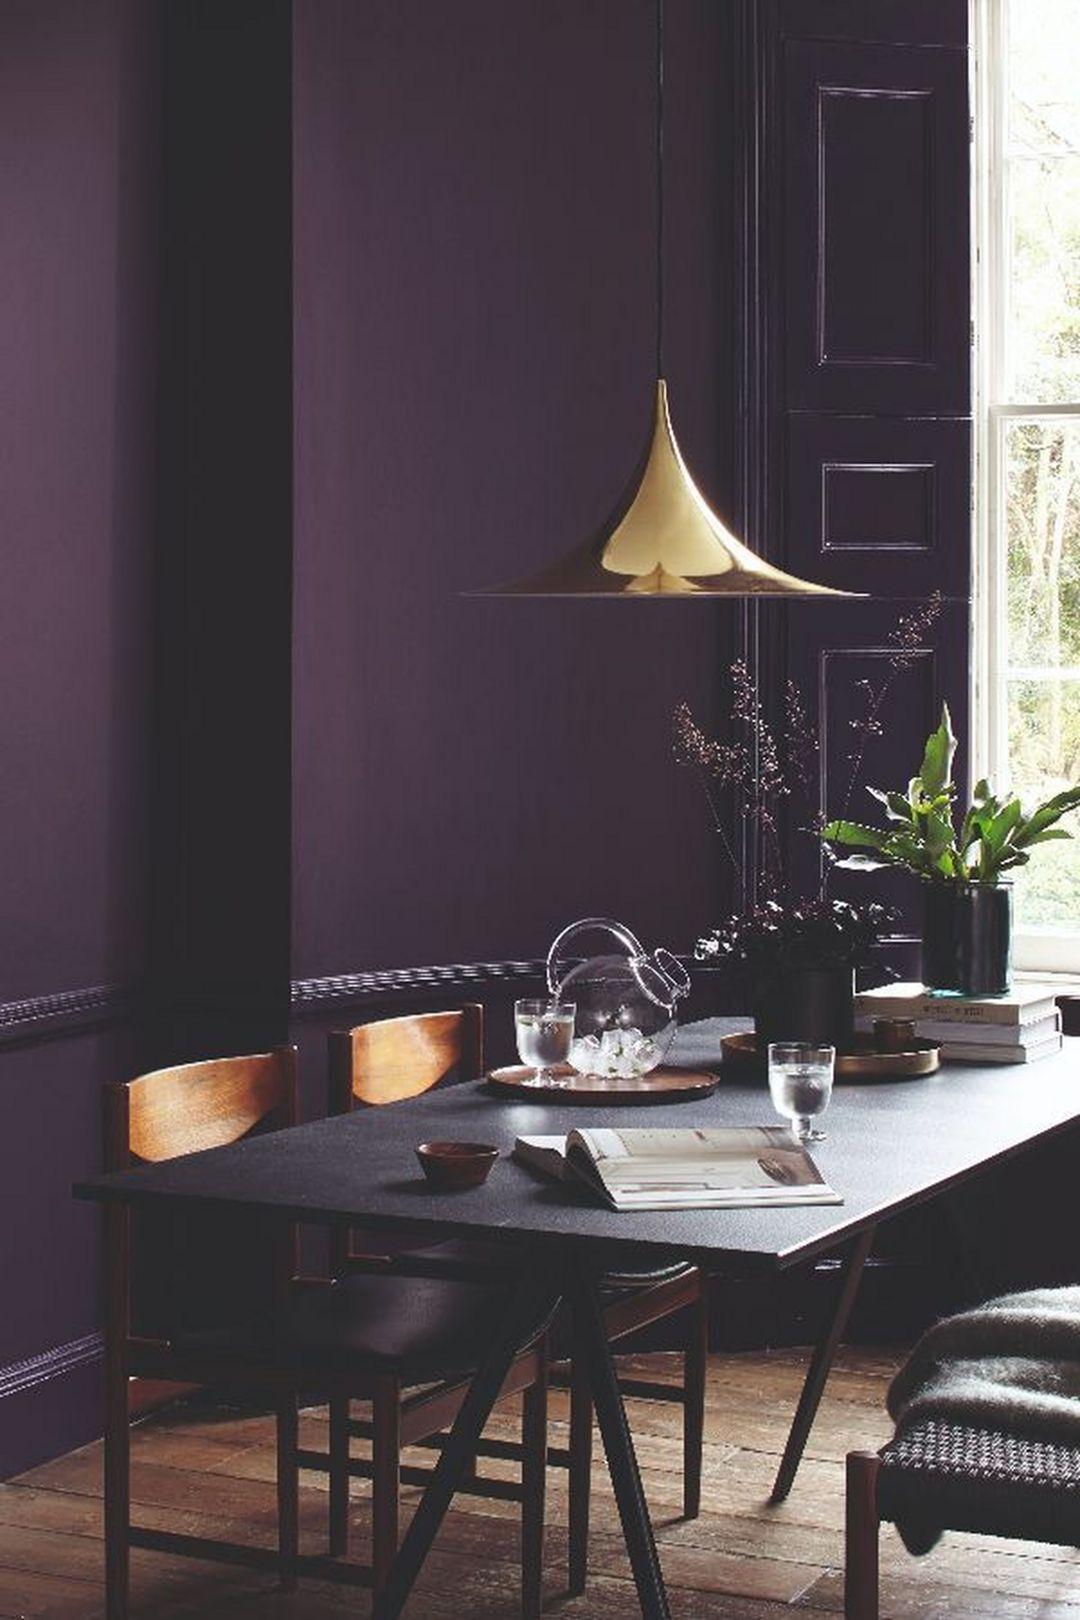 Pin By Ziqin Li On Wande Purple Living Room Living Room Wall Color Room Wall Colors